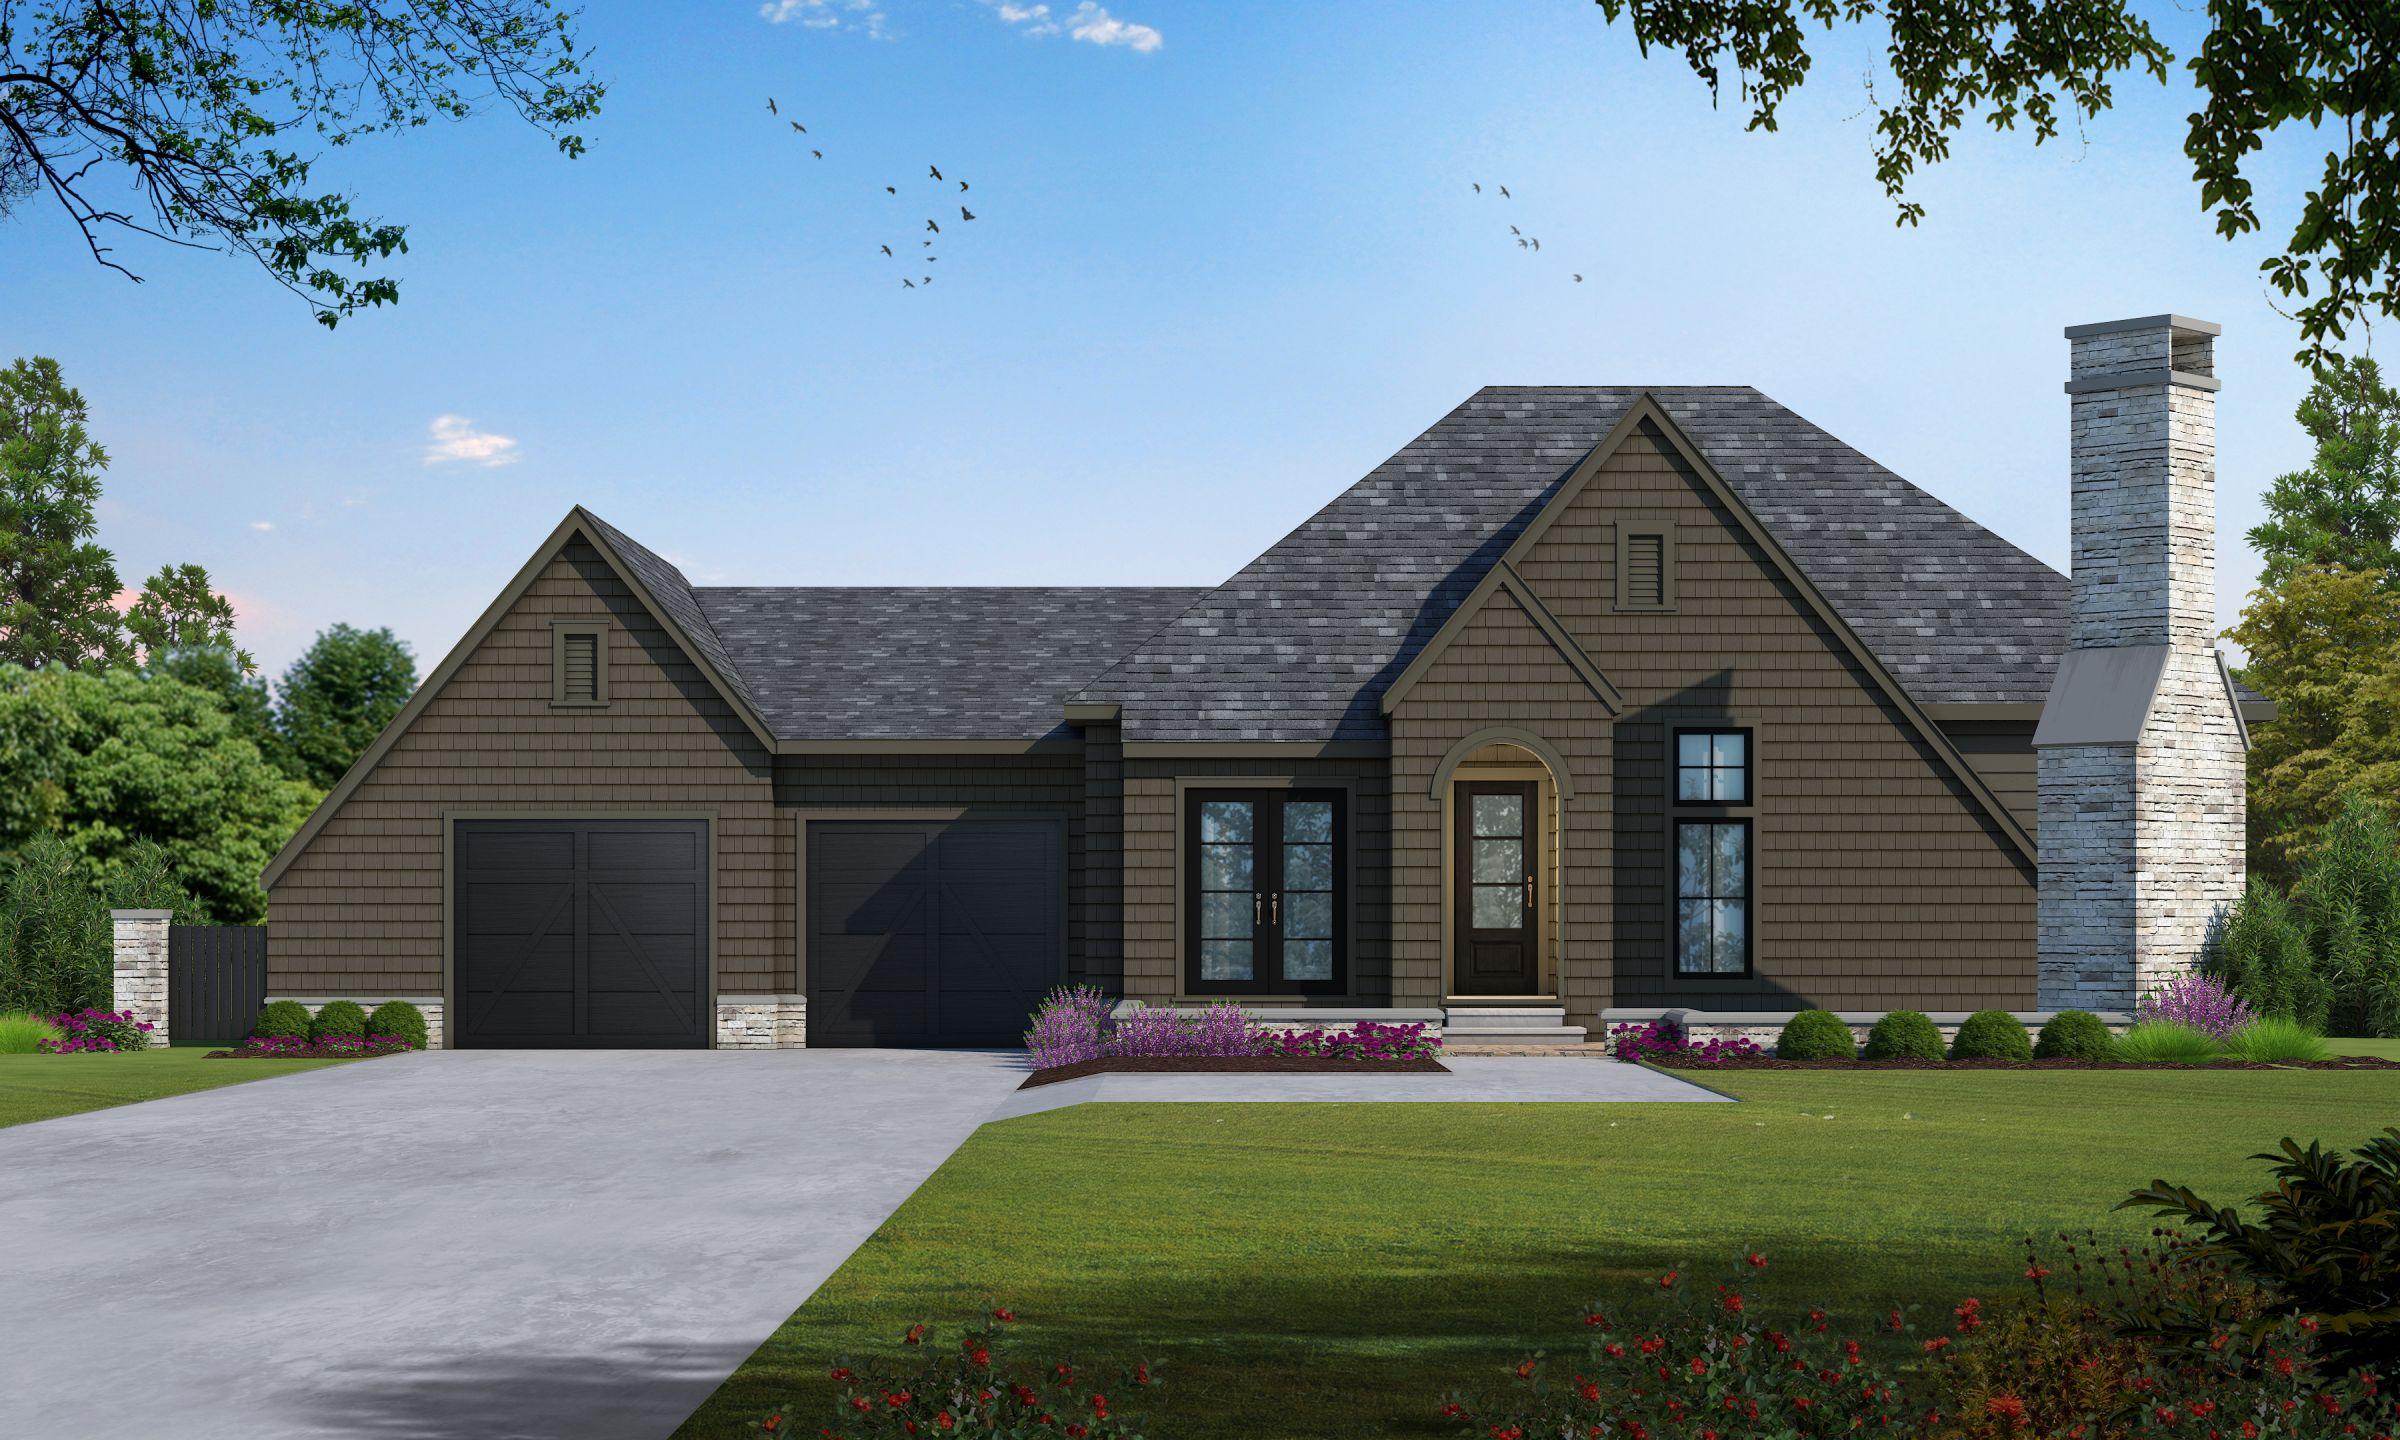 residential-warren-county-iowa-0-acres-listing-number-15598-2-2021-06-18-132746.jpg